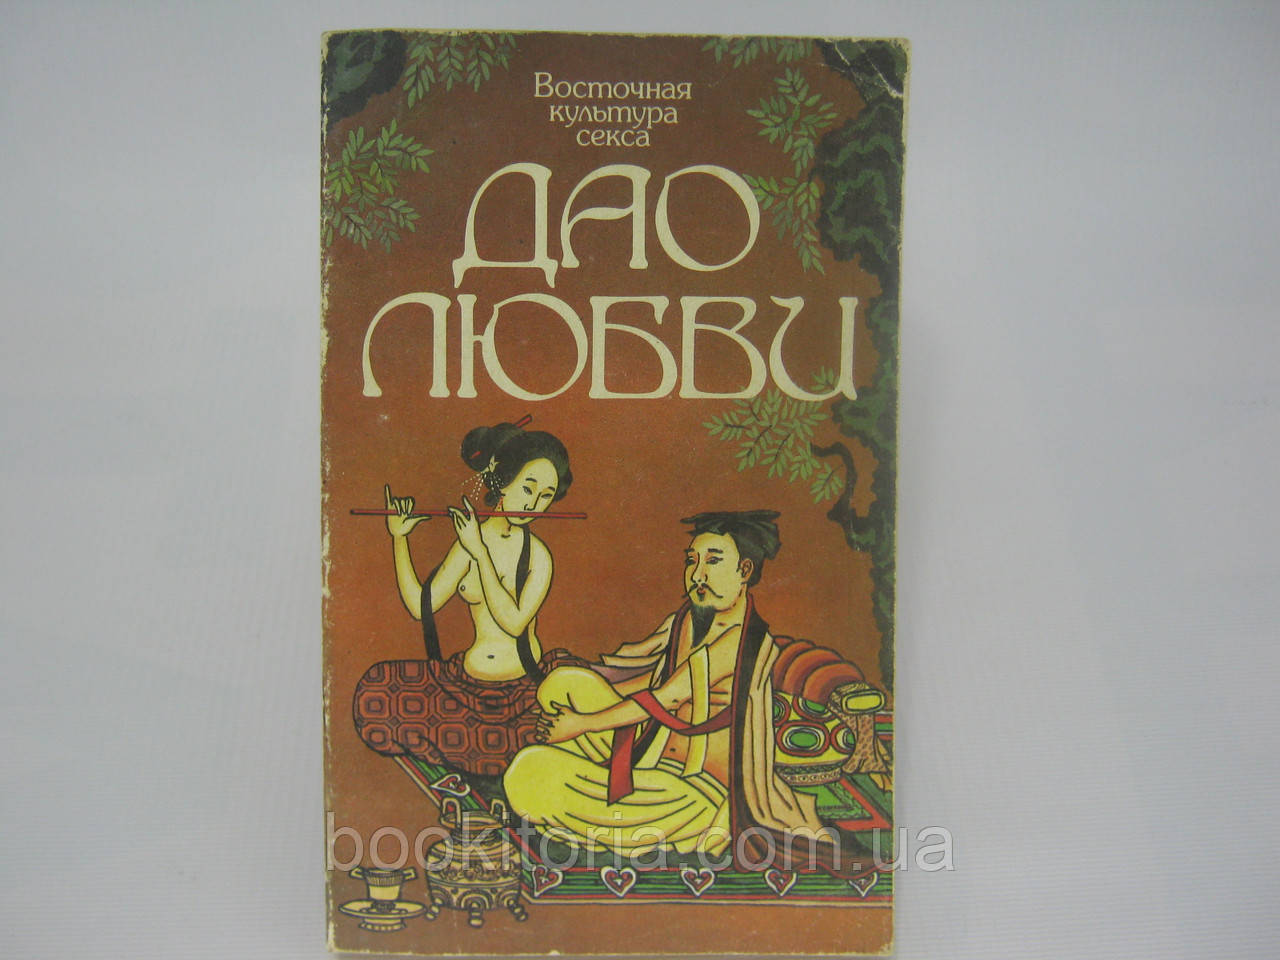 Восточная культура секса. Дао любви. Тантра-йога (б/у).